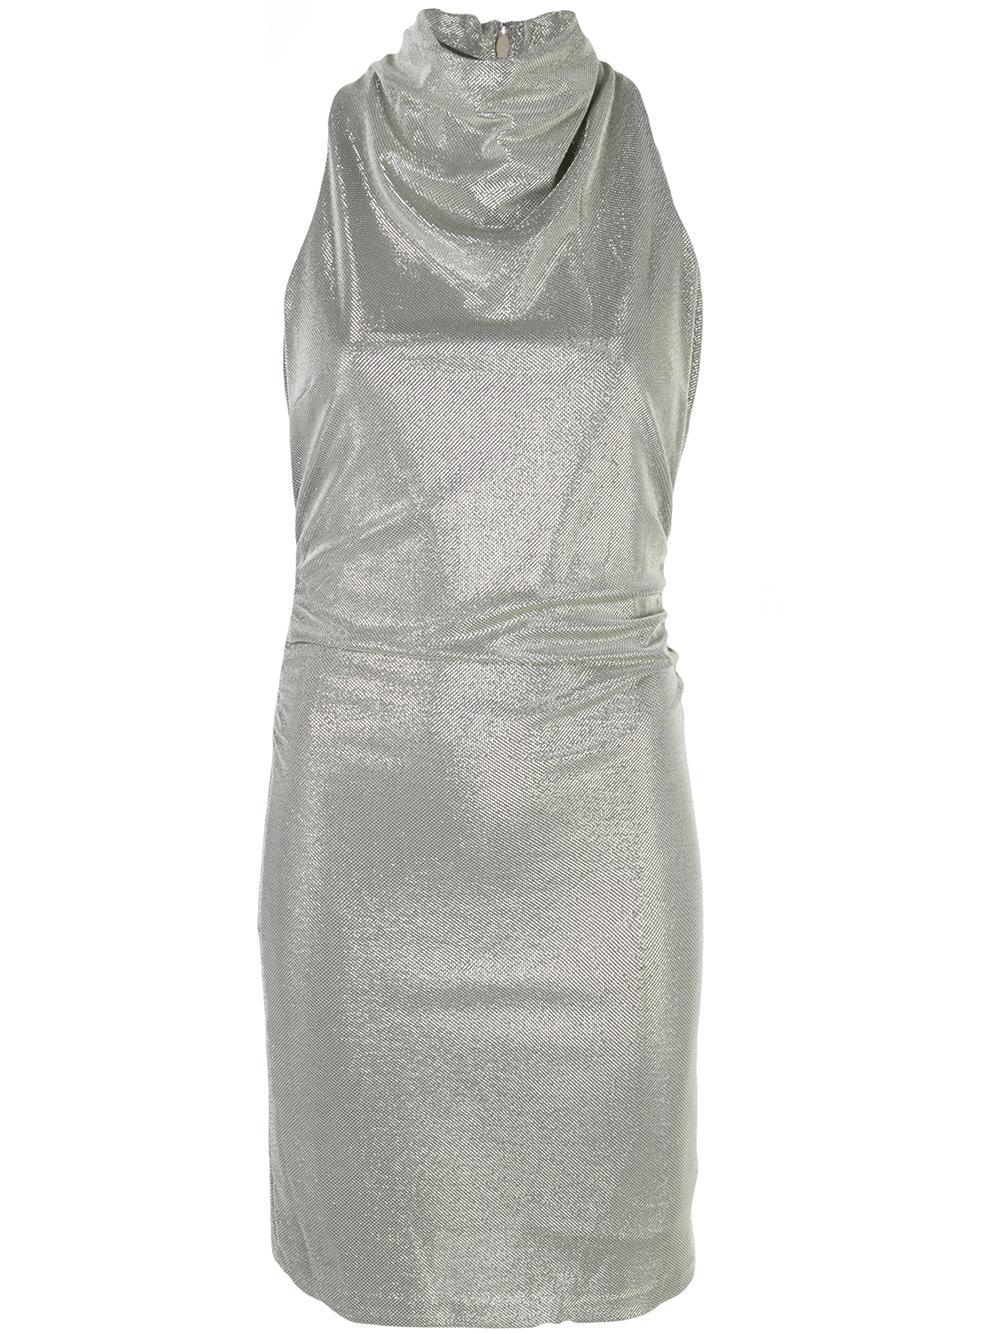 Draped Mock Neck Metallic Knit Dress Item # MKM153064